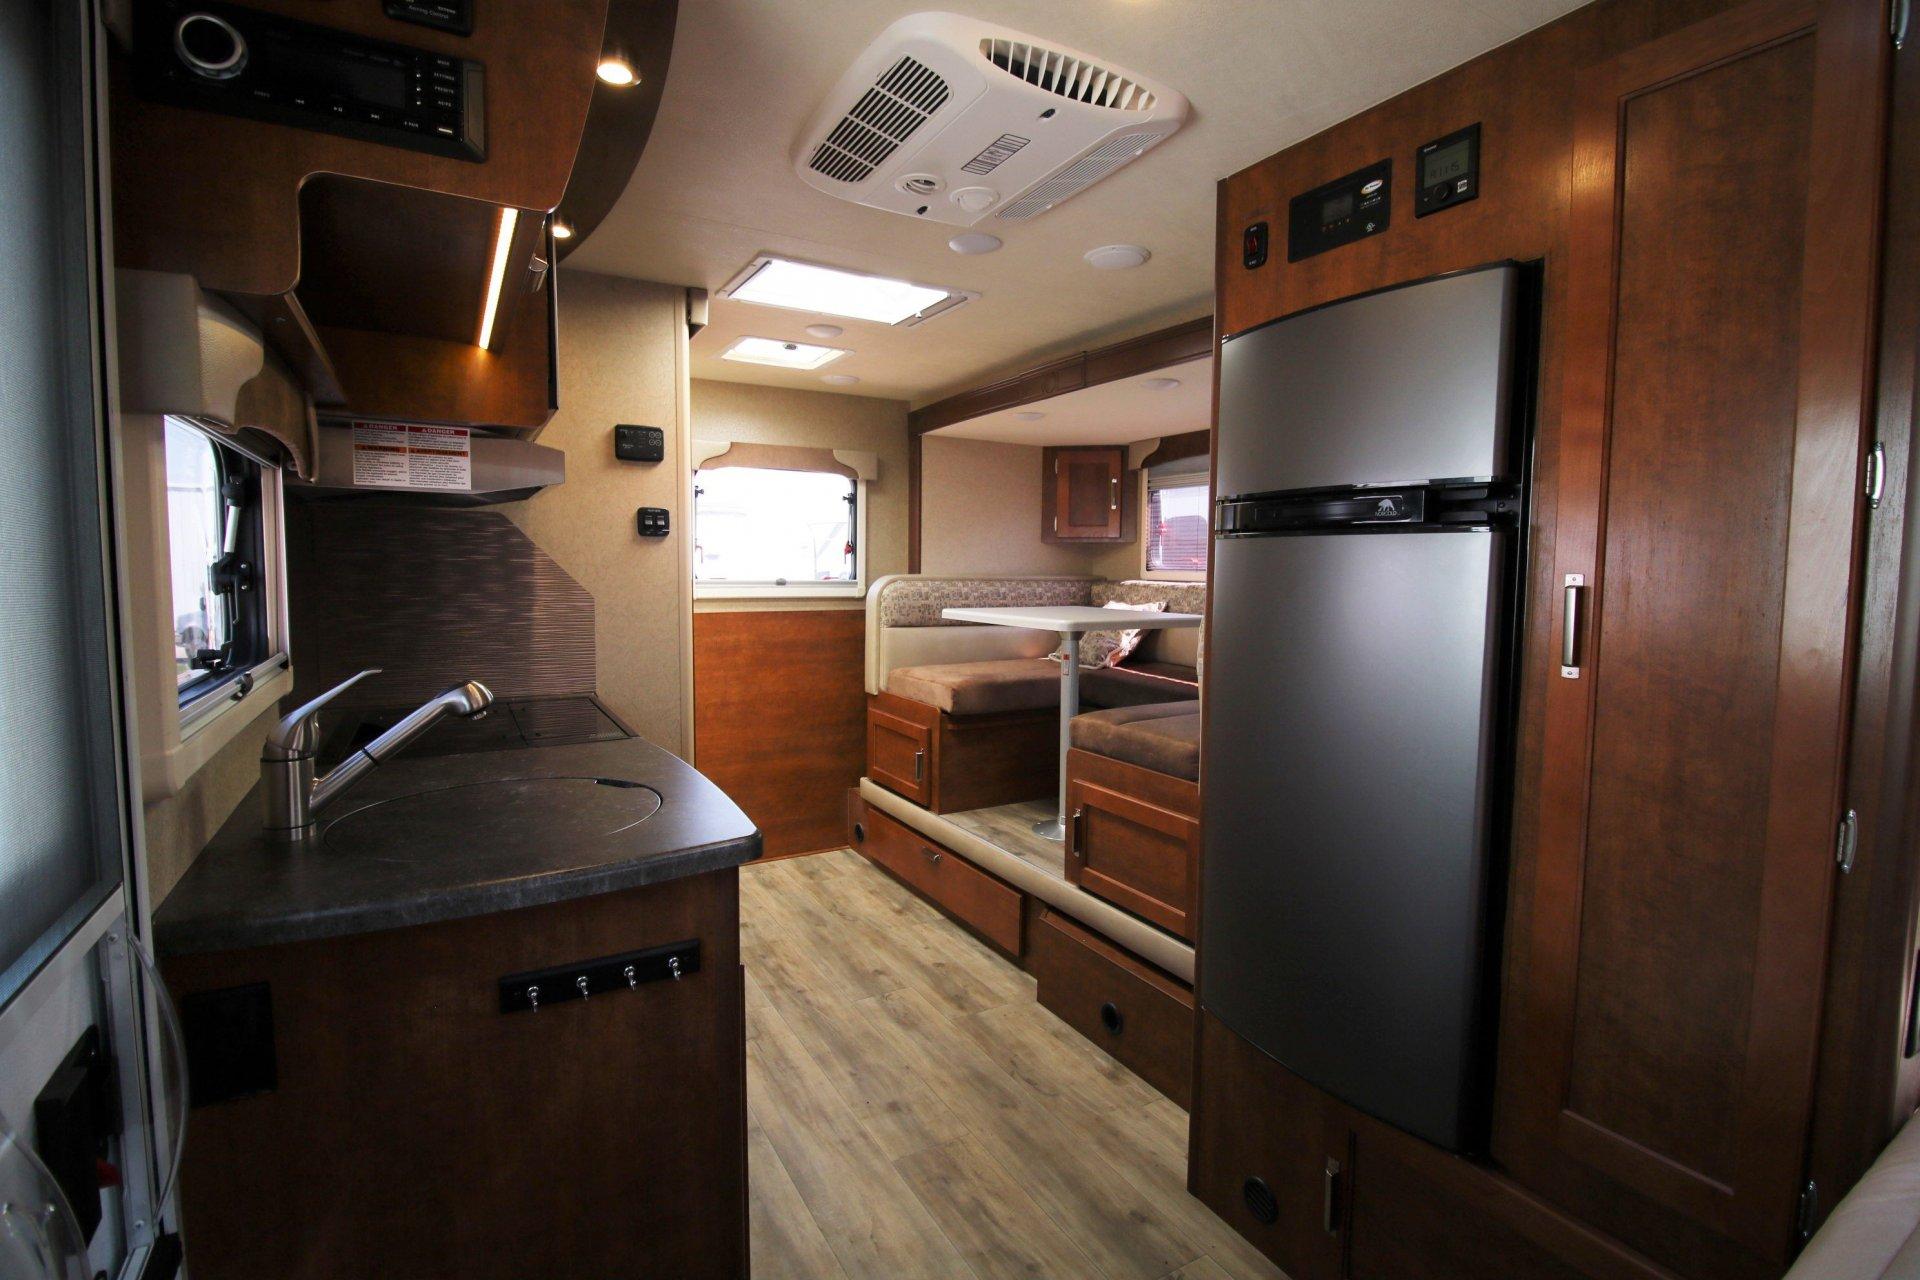 2019 LANCE LANCE 1575 - Airstreams | Campers London ...